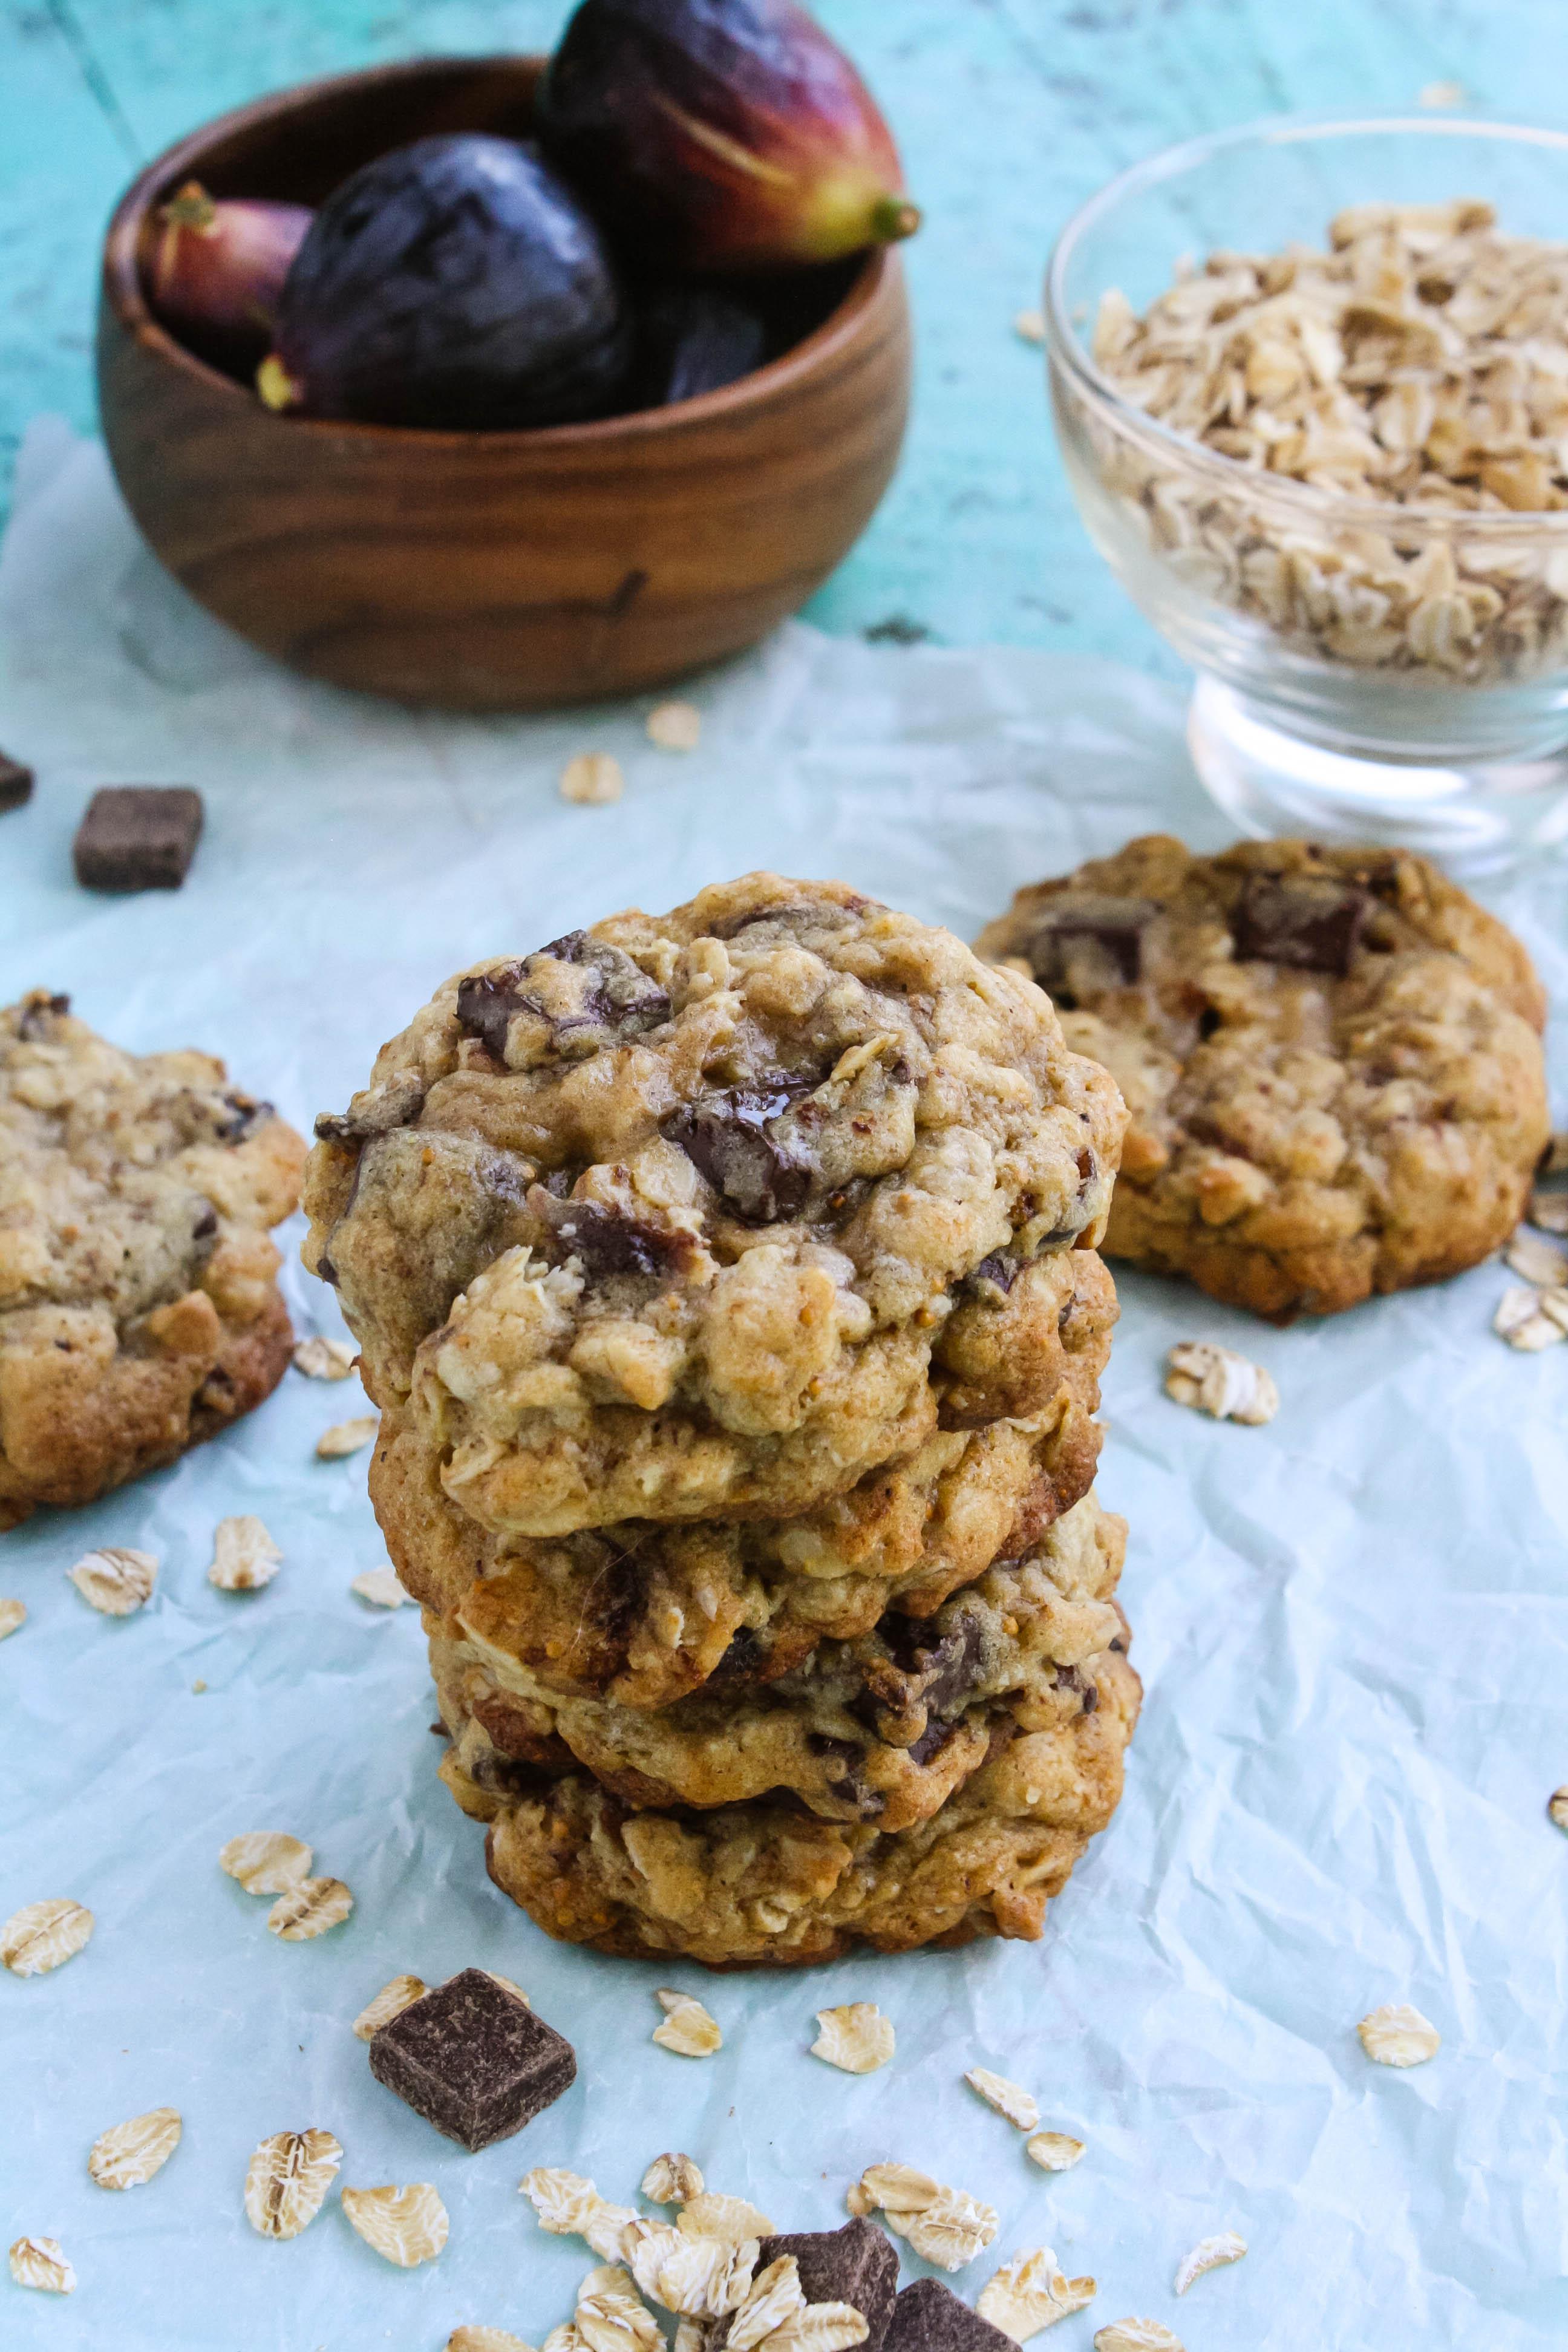 Oatmeal fig cookies with dark chocolate chunks are wonderfully flavorful cookies. Oatmeal fig cookies with dark chocolate chunks are thick, rich, and oh so good!